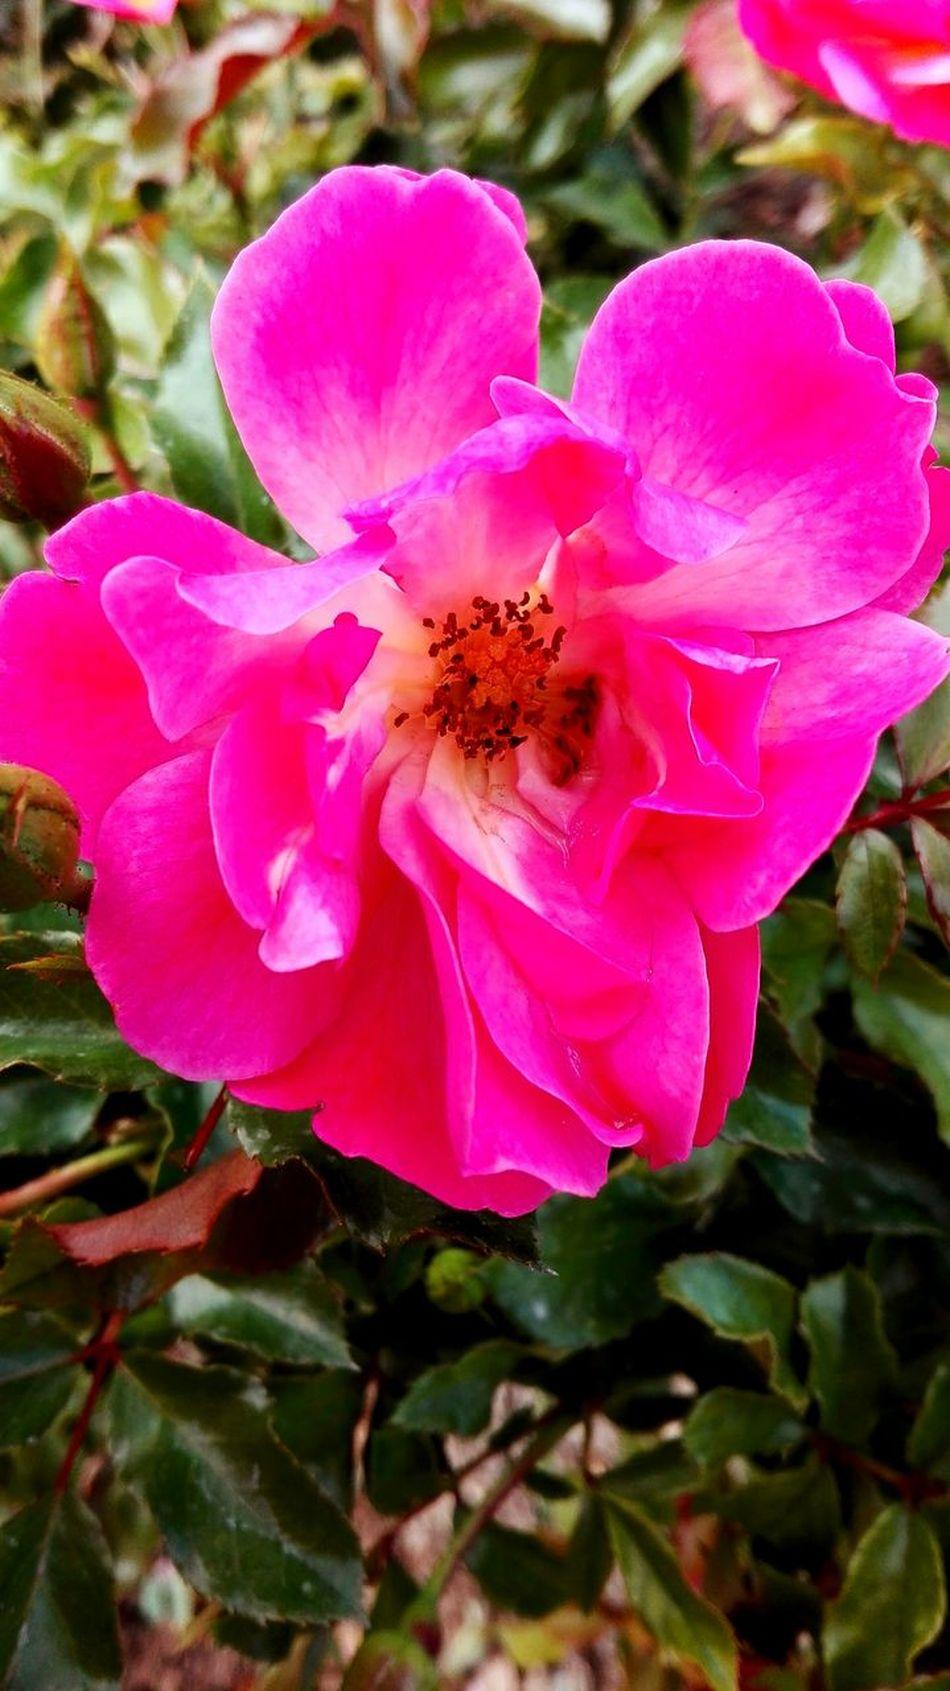 Pink Color Petal Flower Beauty In Nature Nature Fragility Flower Head No People Plant Close-up Orchid Growth Pollen Outdoors Leaf Freshness Day HDR çiçek Bahce Cicekler Konya Konyagram Mevlana Muzesi Huaweip8 Lite